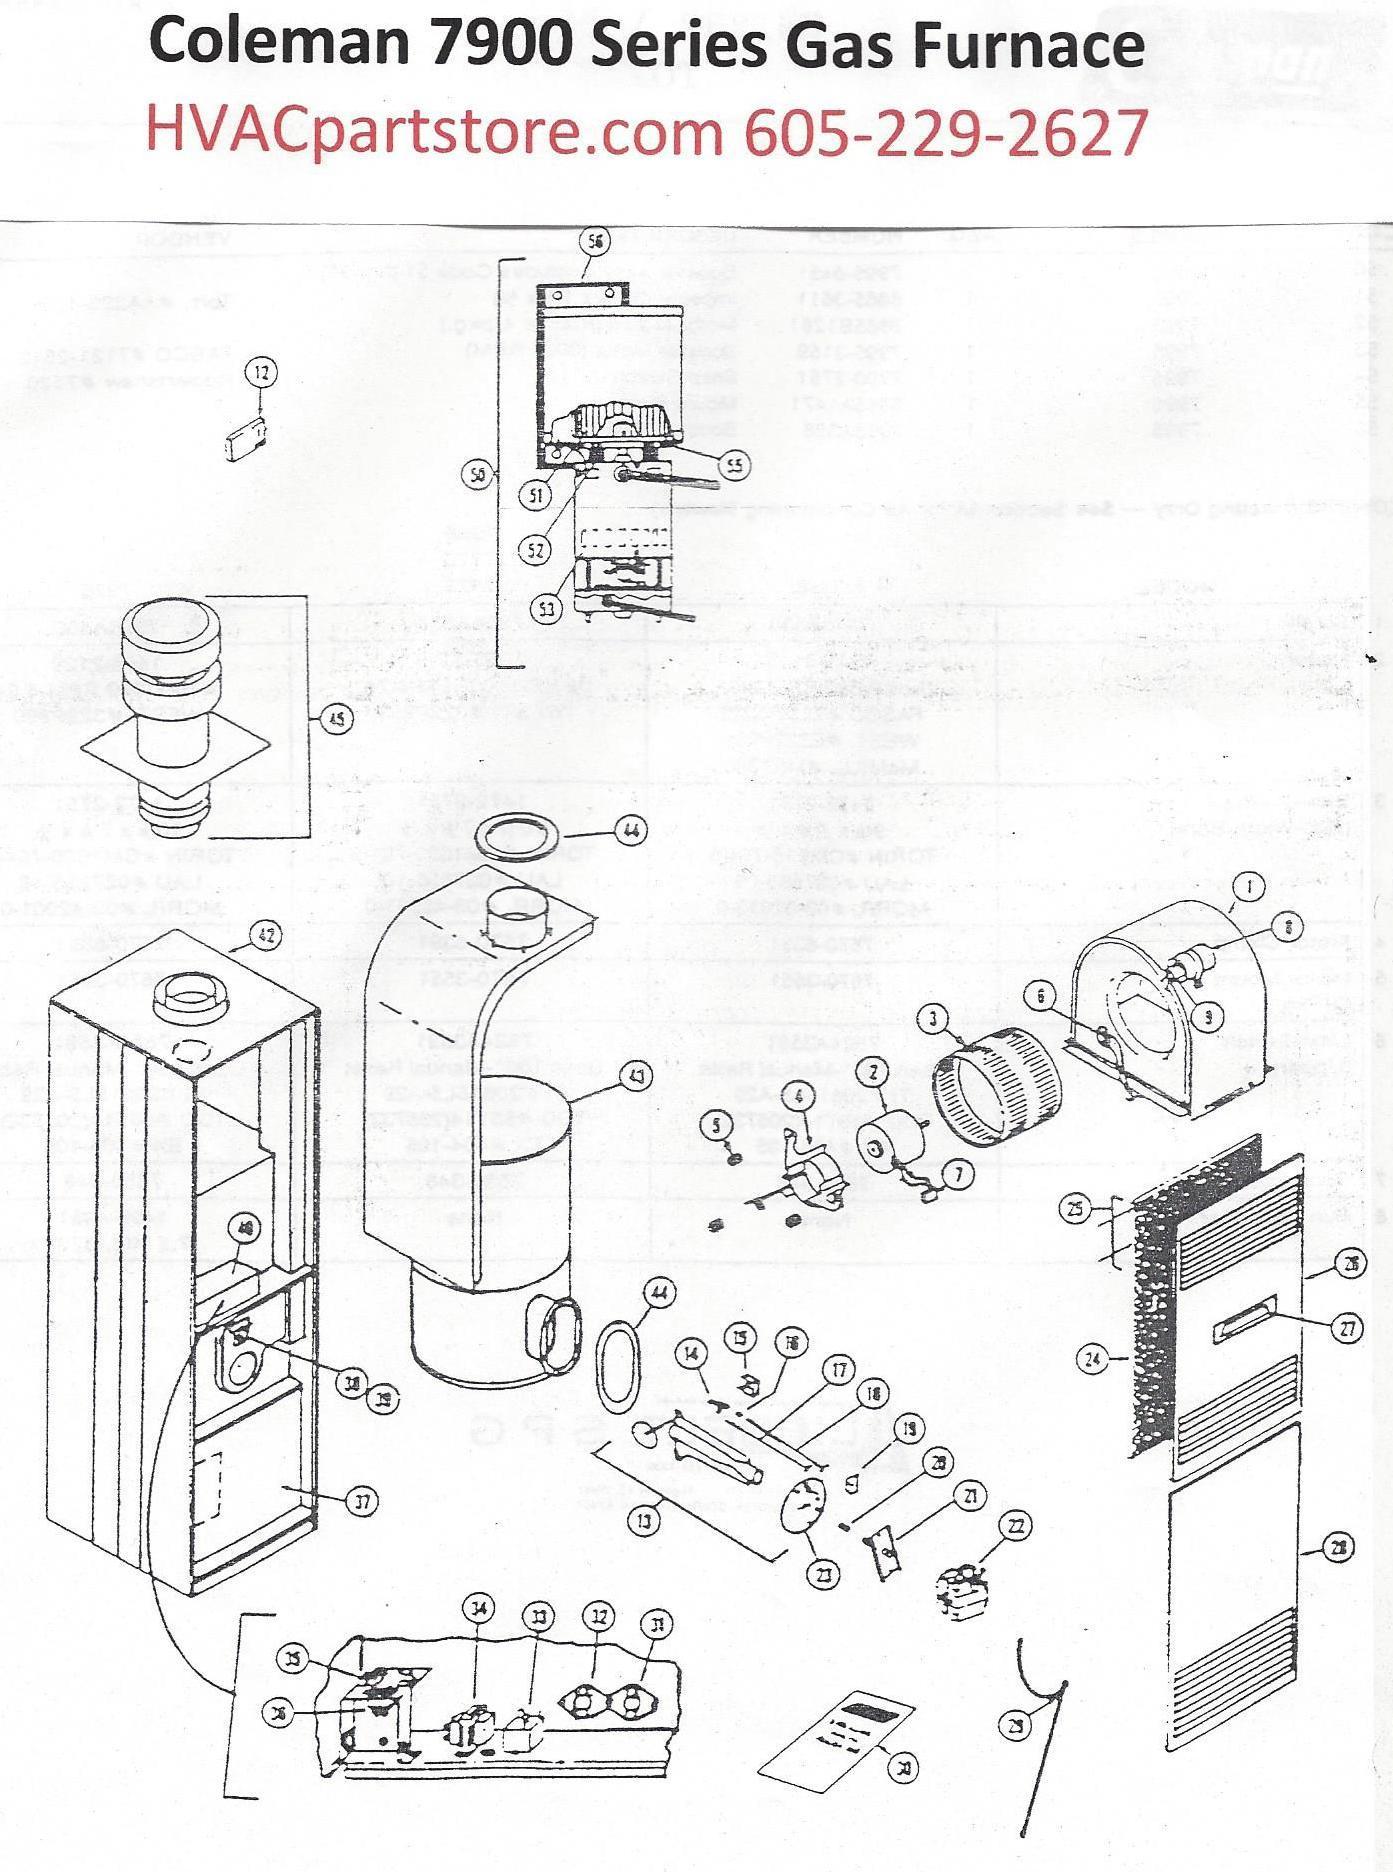 [SCHEMATICS_4NL]  GN_1544] Evcon Dgat070Bdd Furnace Wiring Diagram Download Diagram | Wiring Diagram For Evcon Dgat070bdd |  | Penghe Strai Emba Mohammedshrine Librar Wiring 101